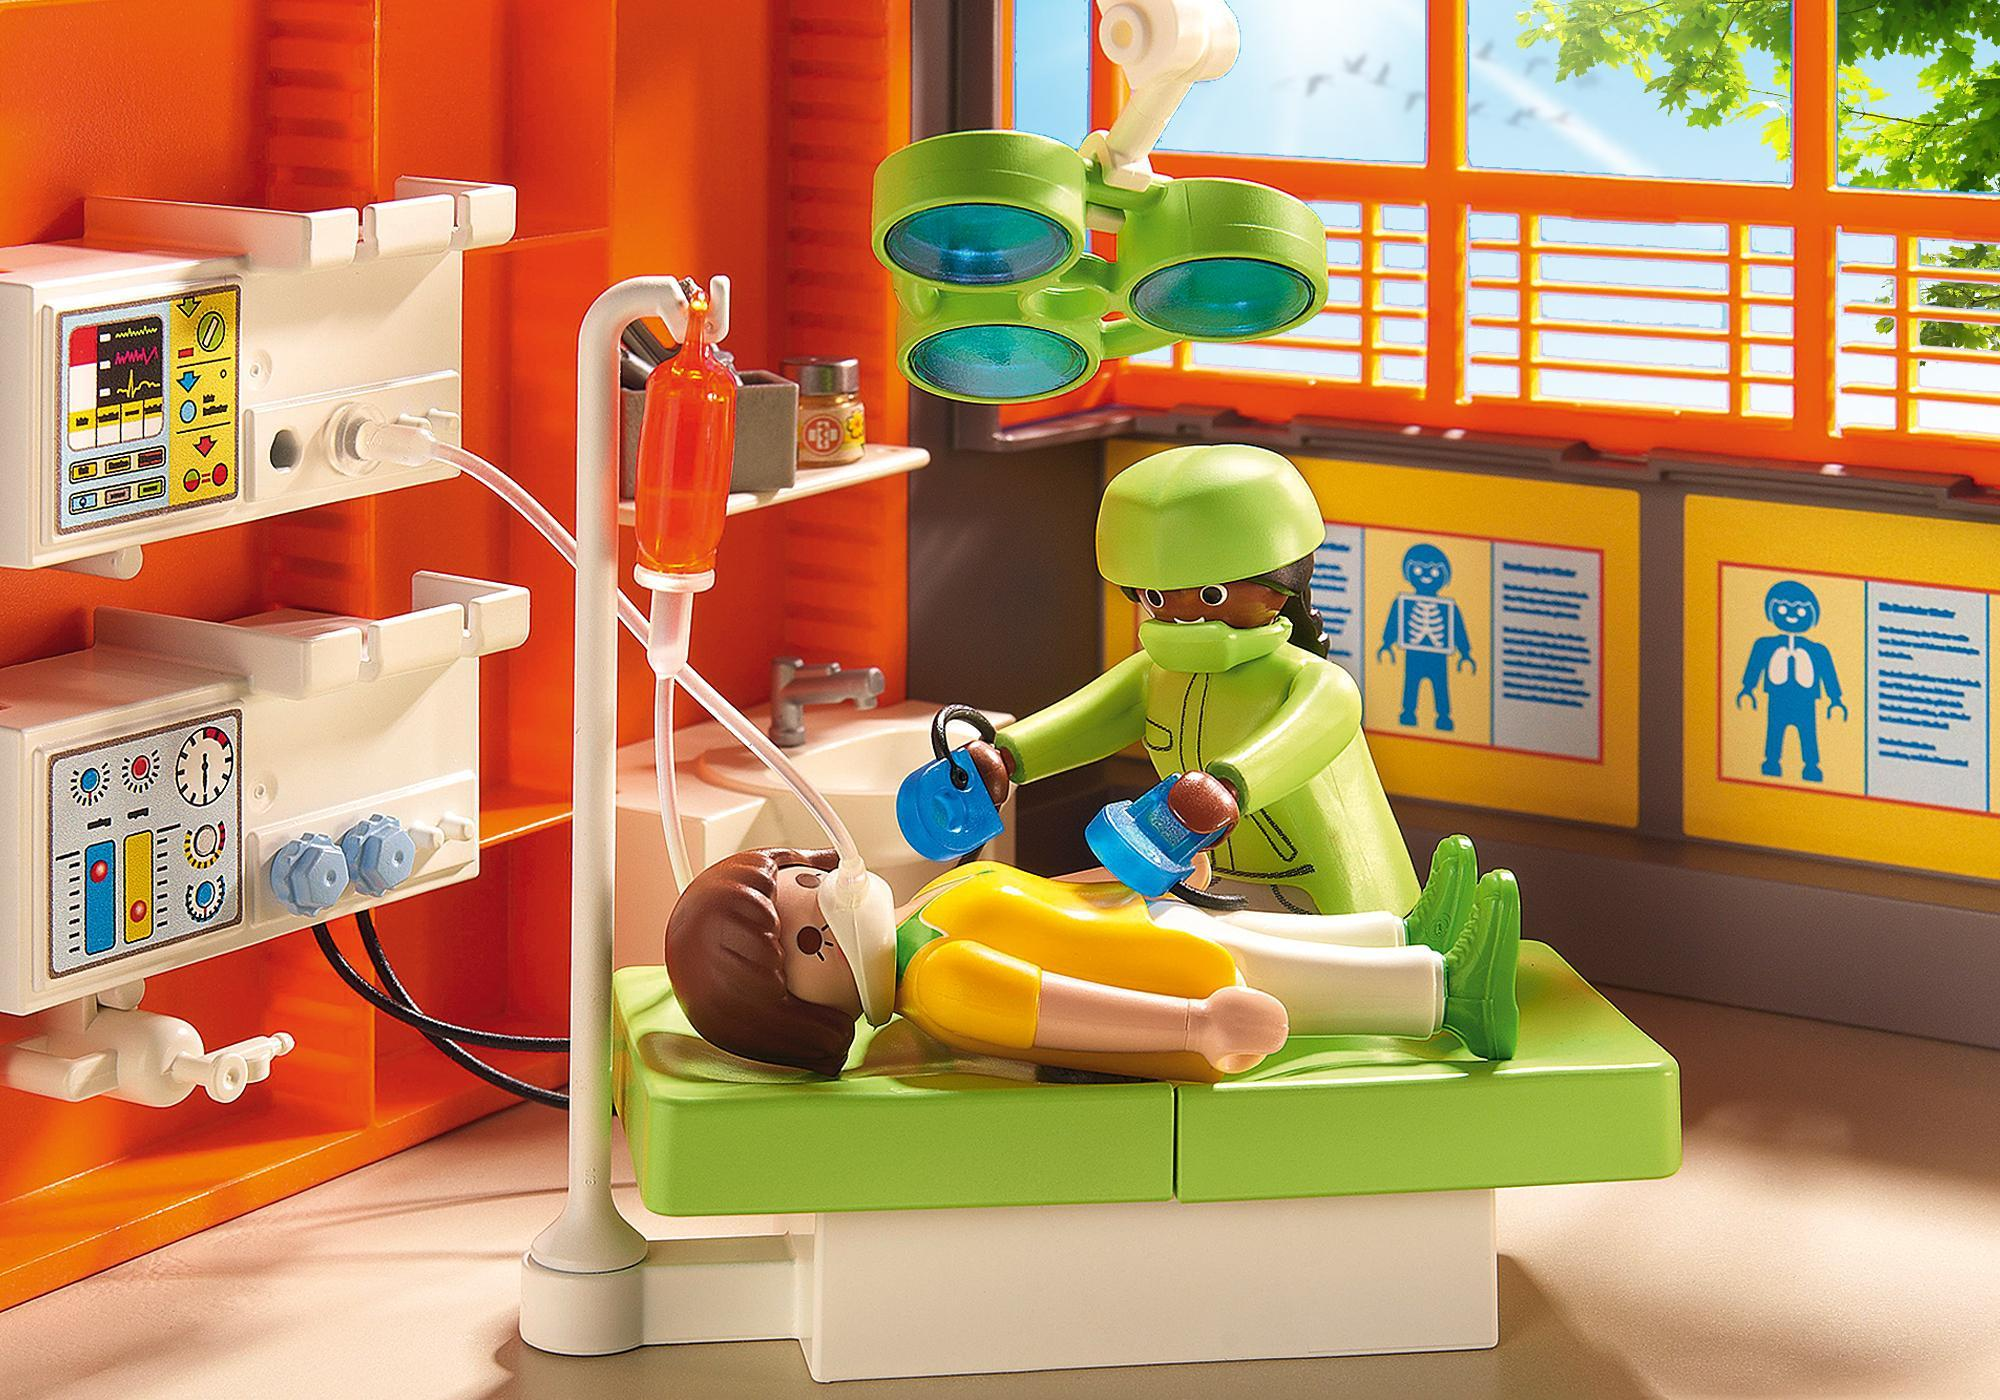 http://media.playmobil.com/i/playmobil/6657_product_extra1